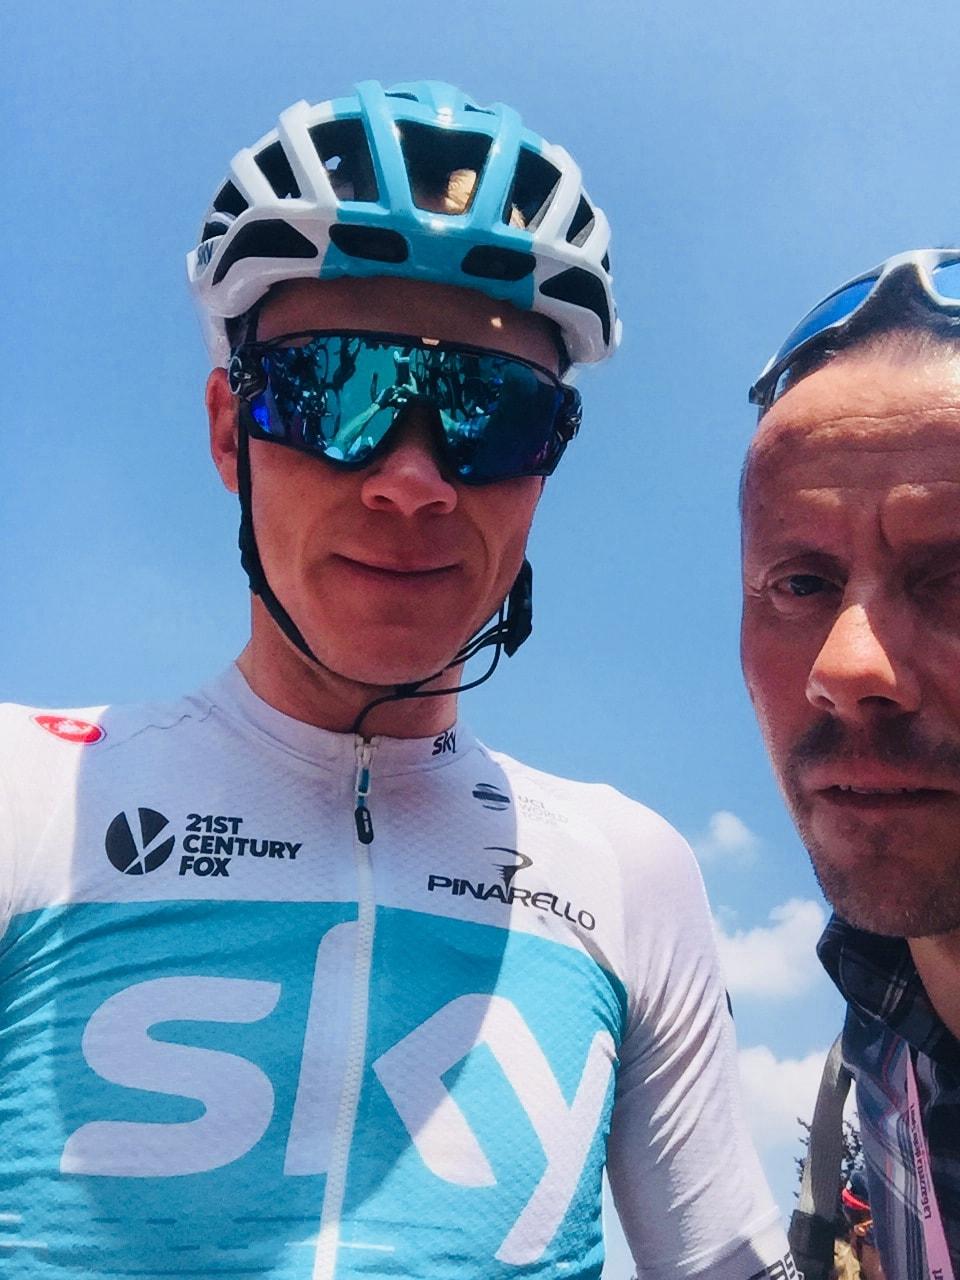 Giro D'Italia 2018: Abbiategrasso